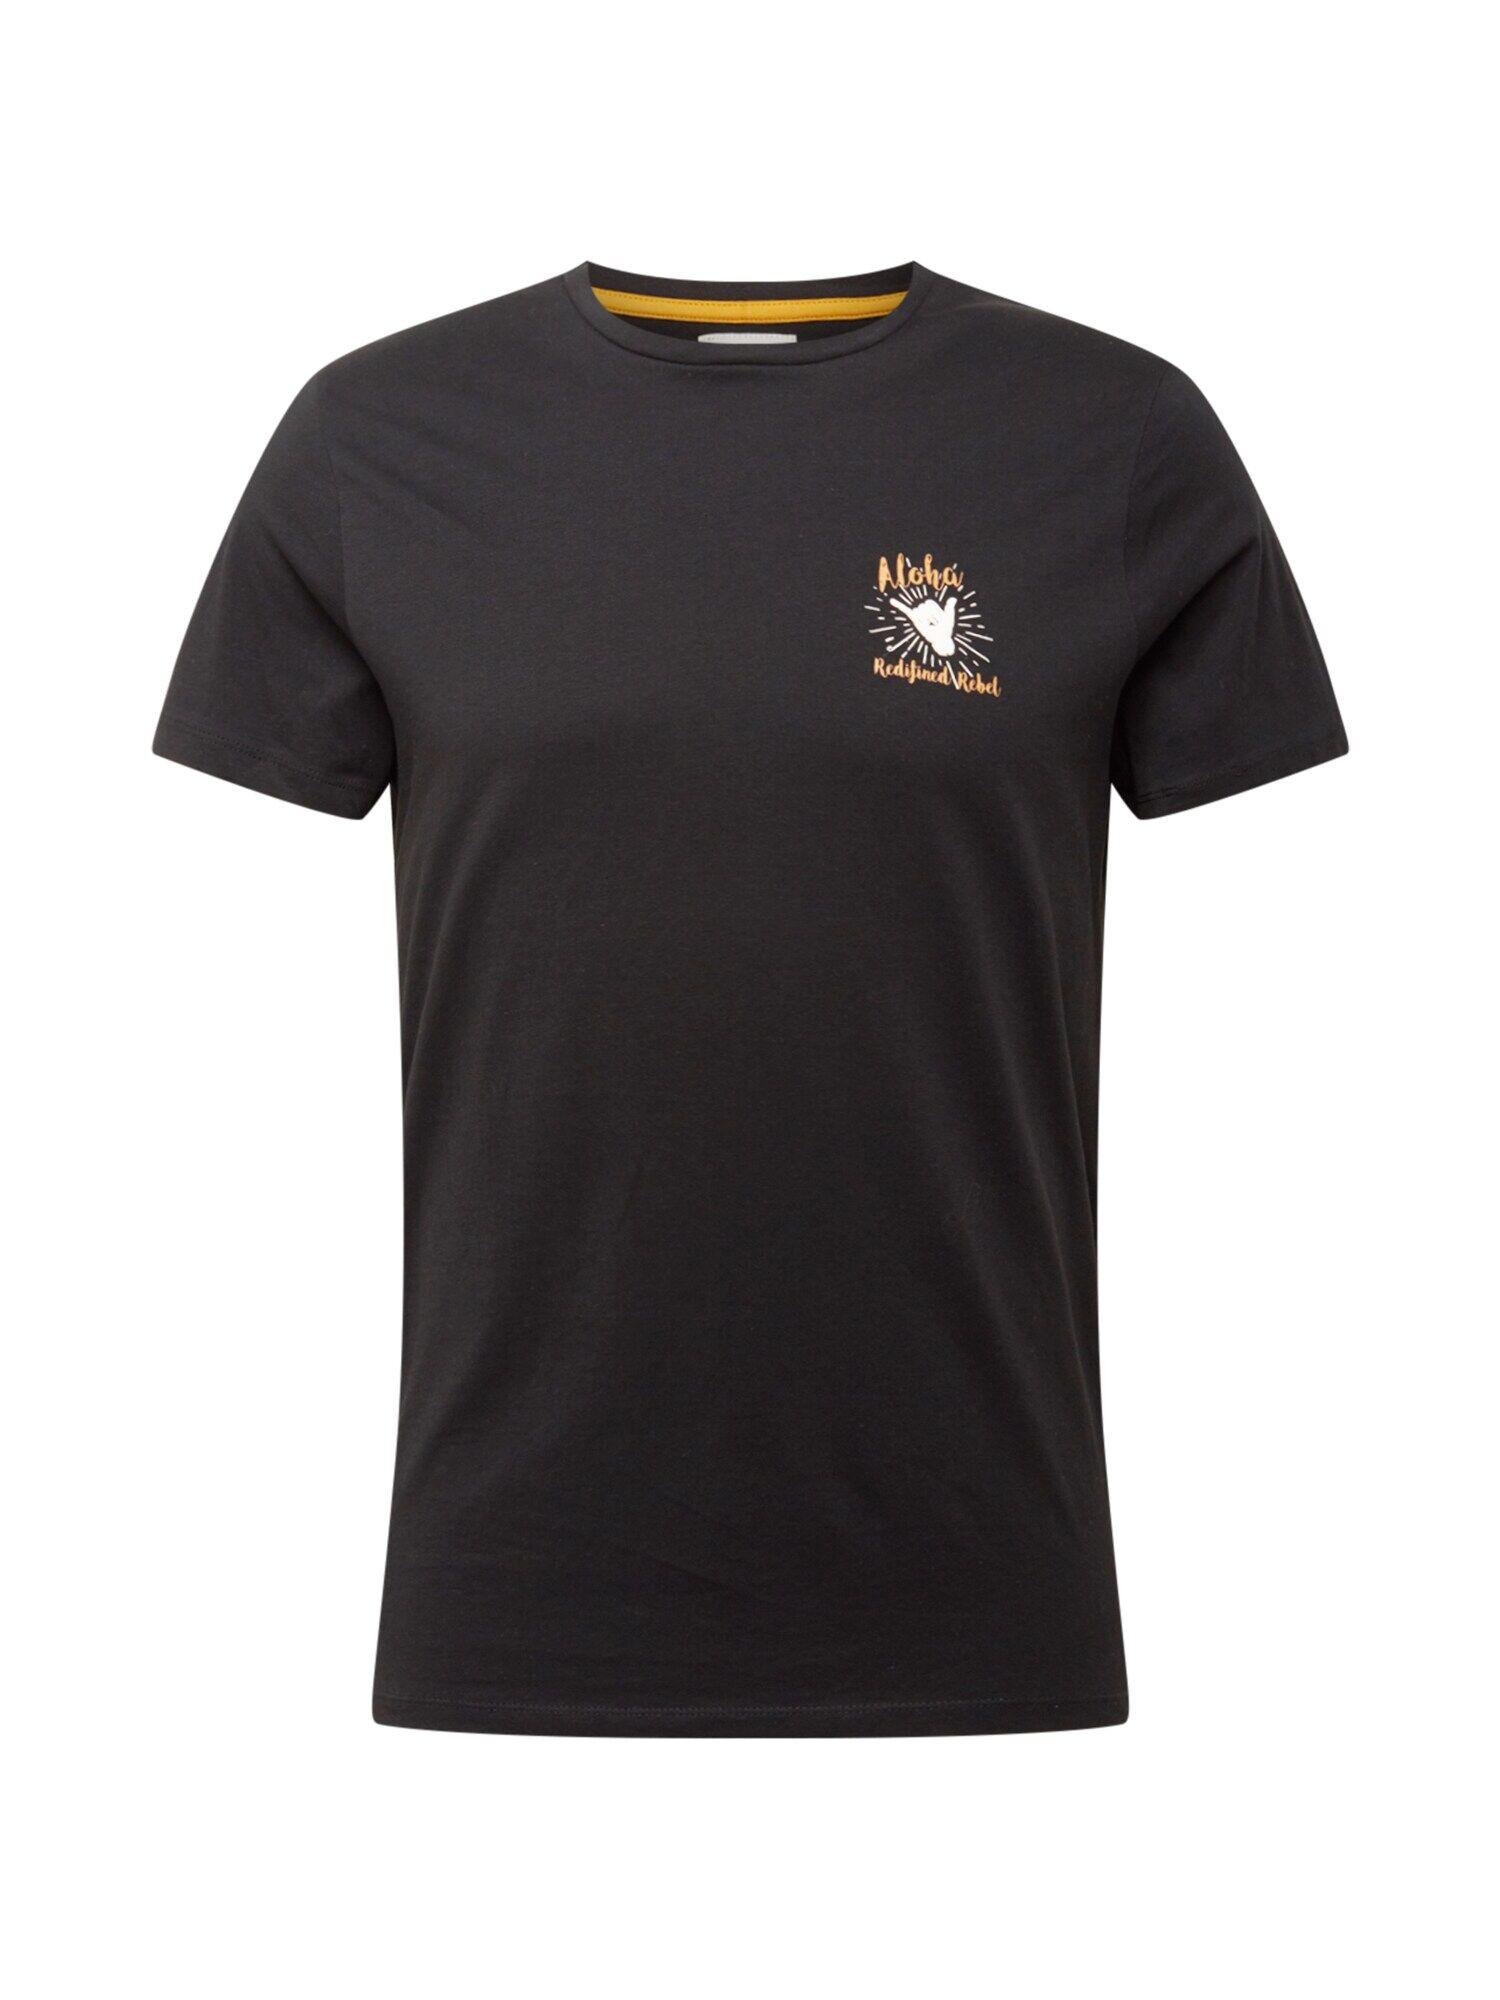 Redefined Rebel T-Shirt 'Ryder'  - Noir - Taille: S - male